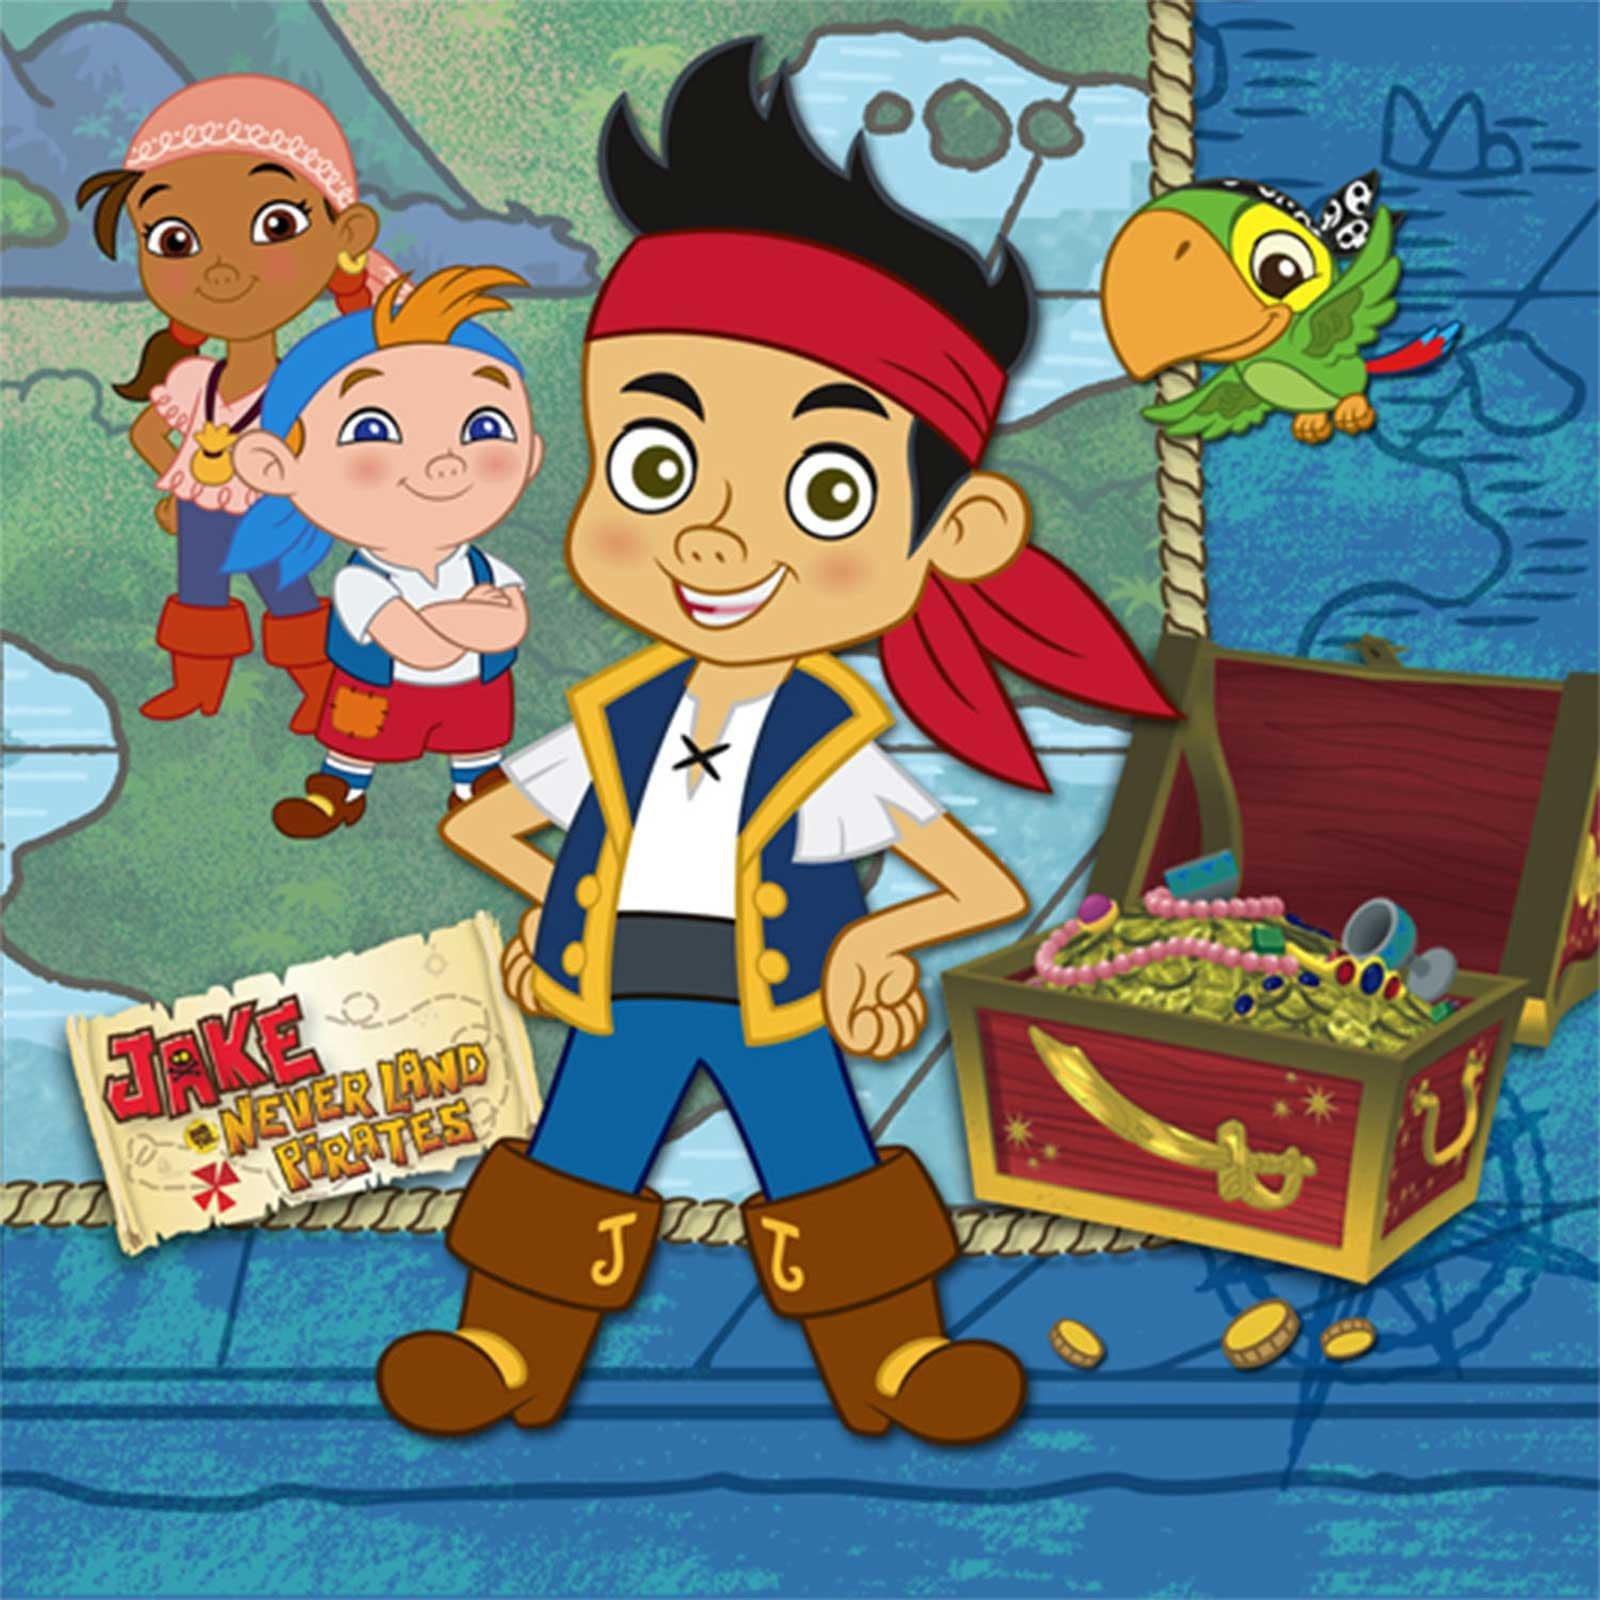 Disney Jake and the Never Land Pirates Beverage Napkins